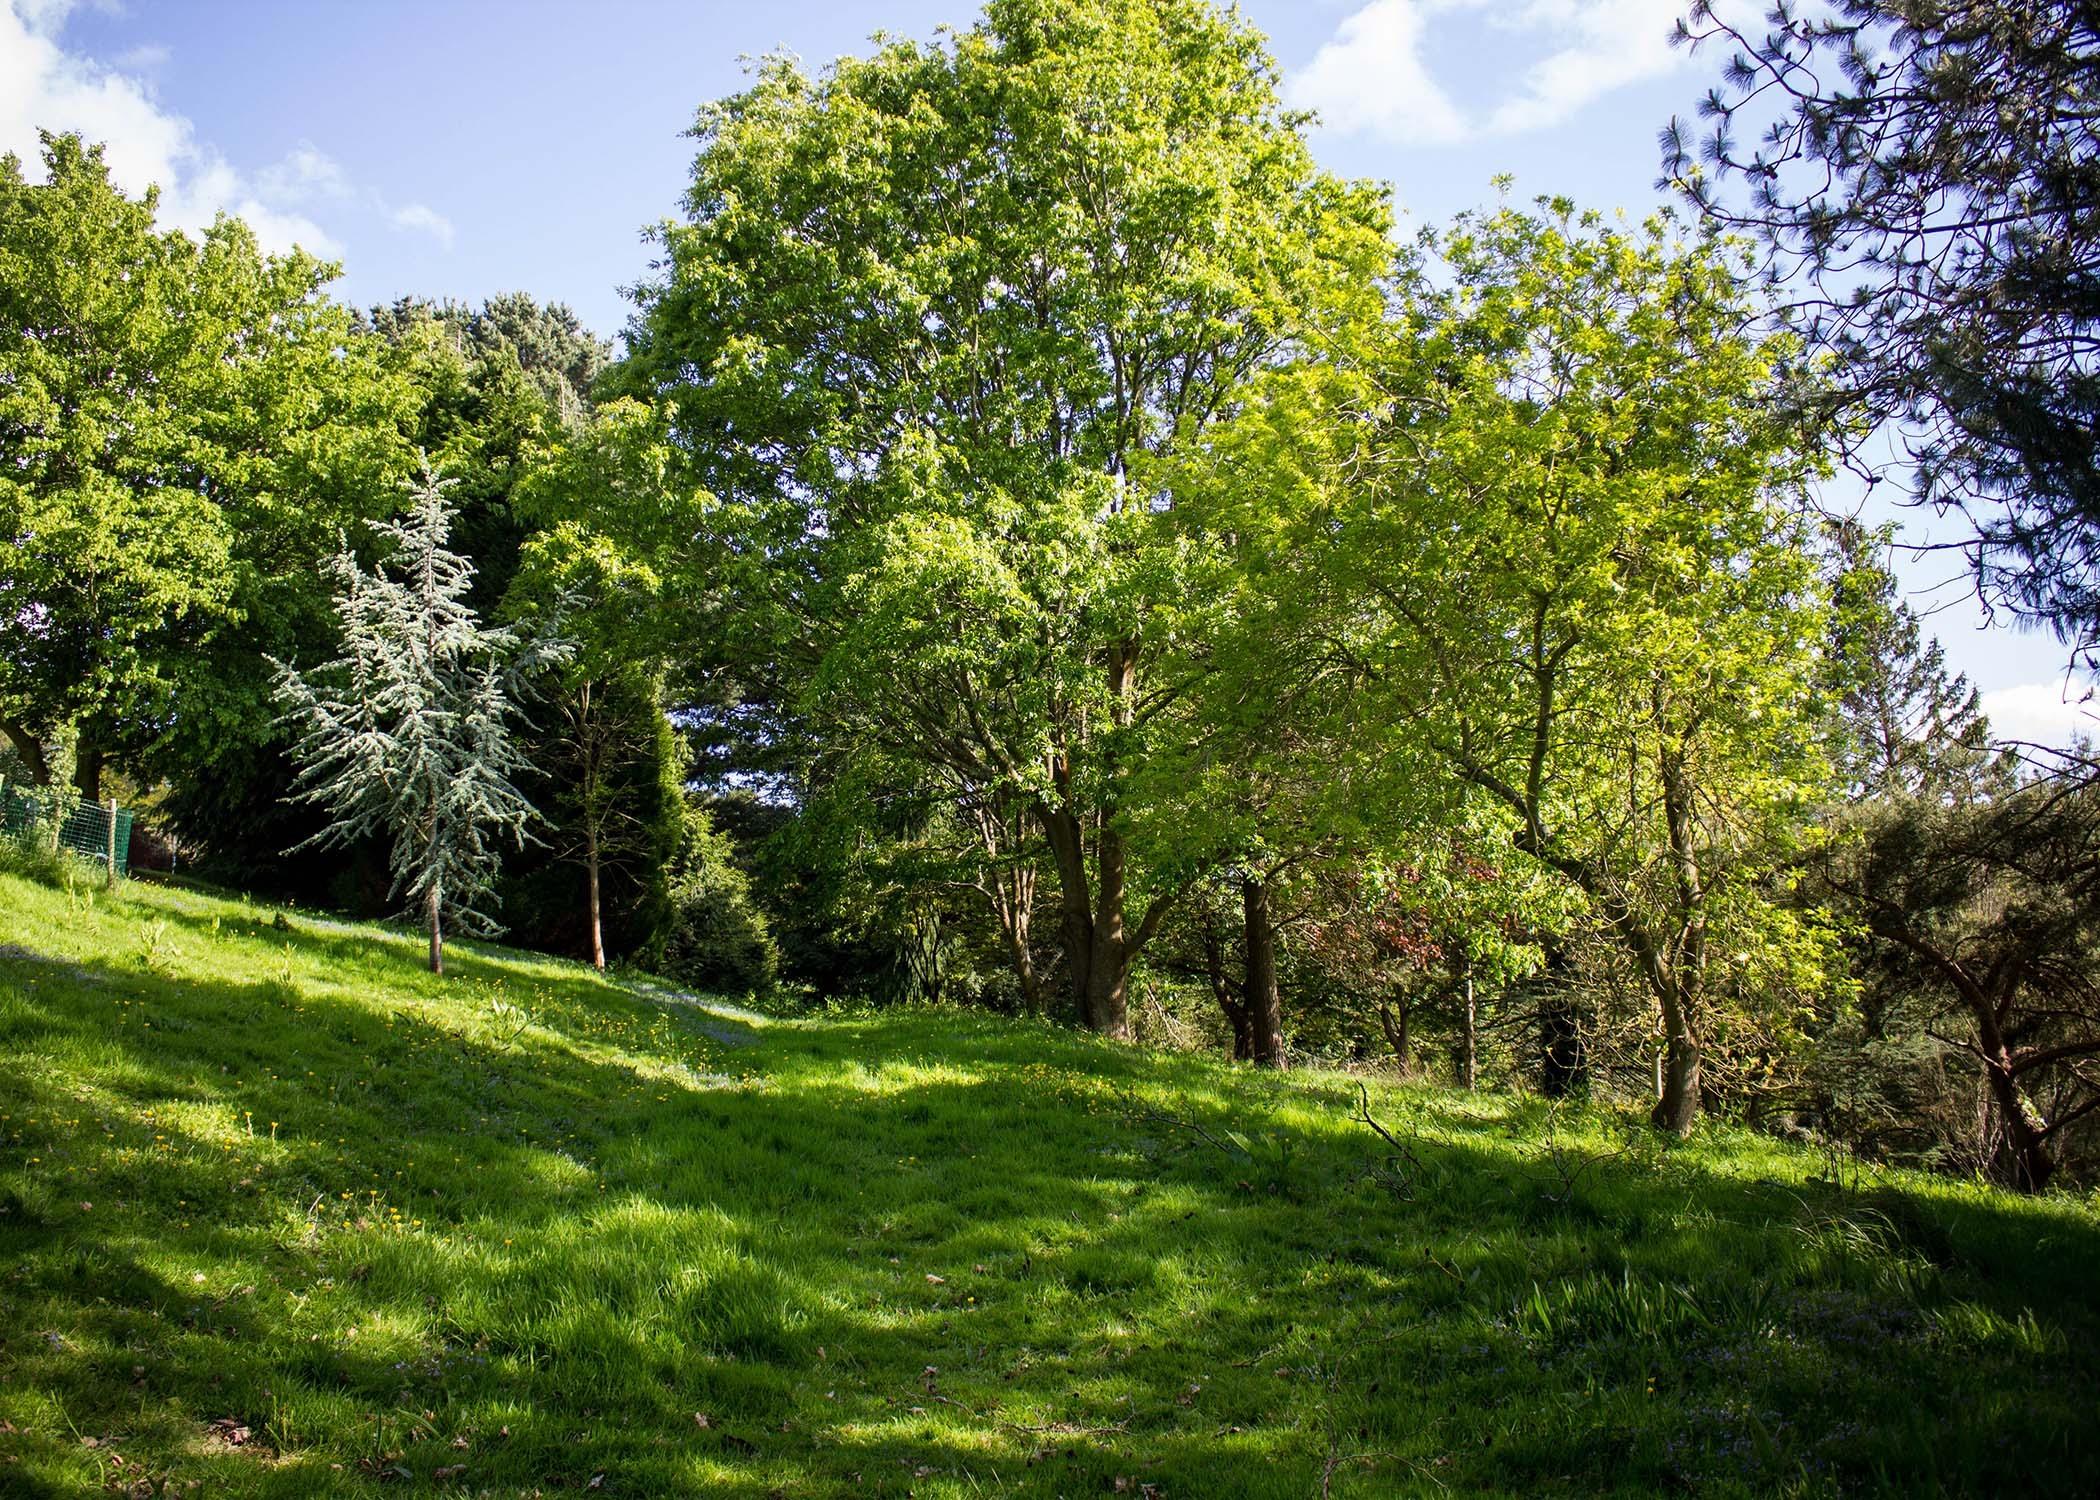 Birks Bank Arboretum